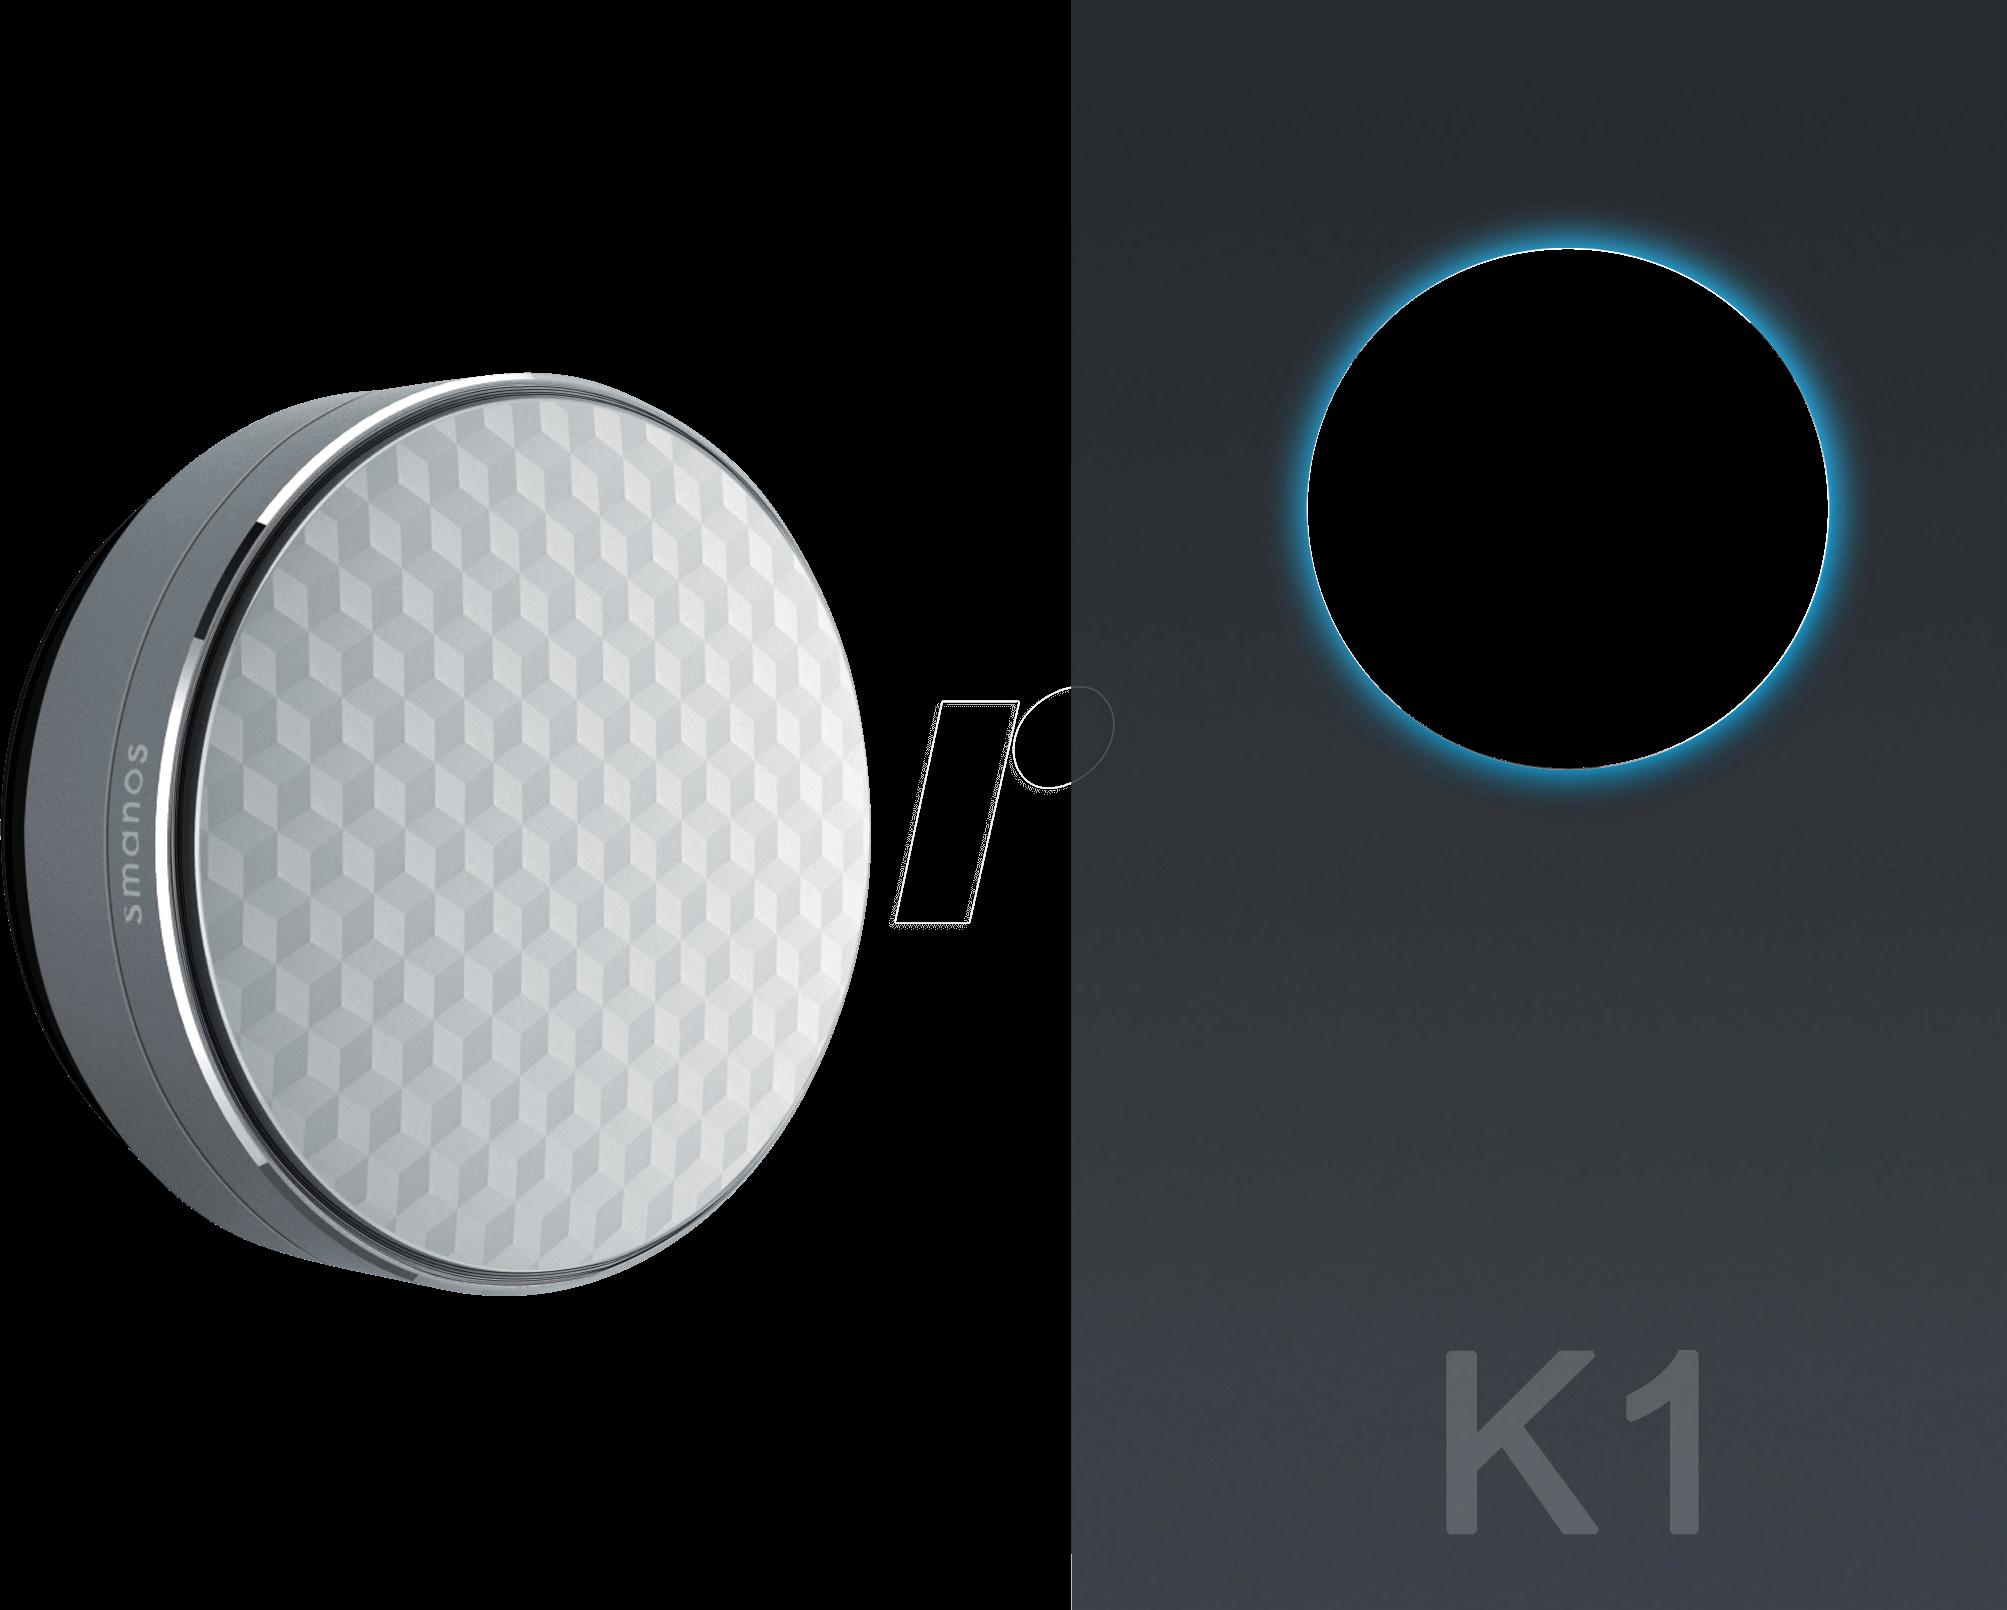 SMANOS K1 - Sicherheitssystem Smart Home, Starter Kit